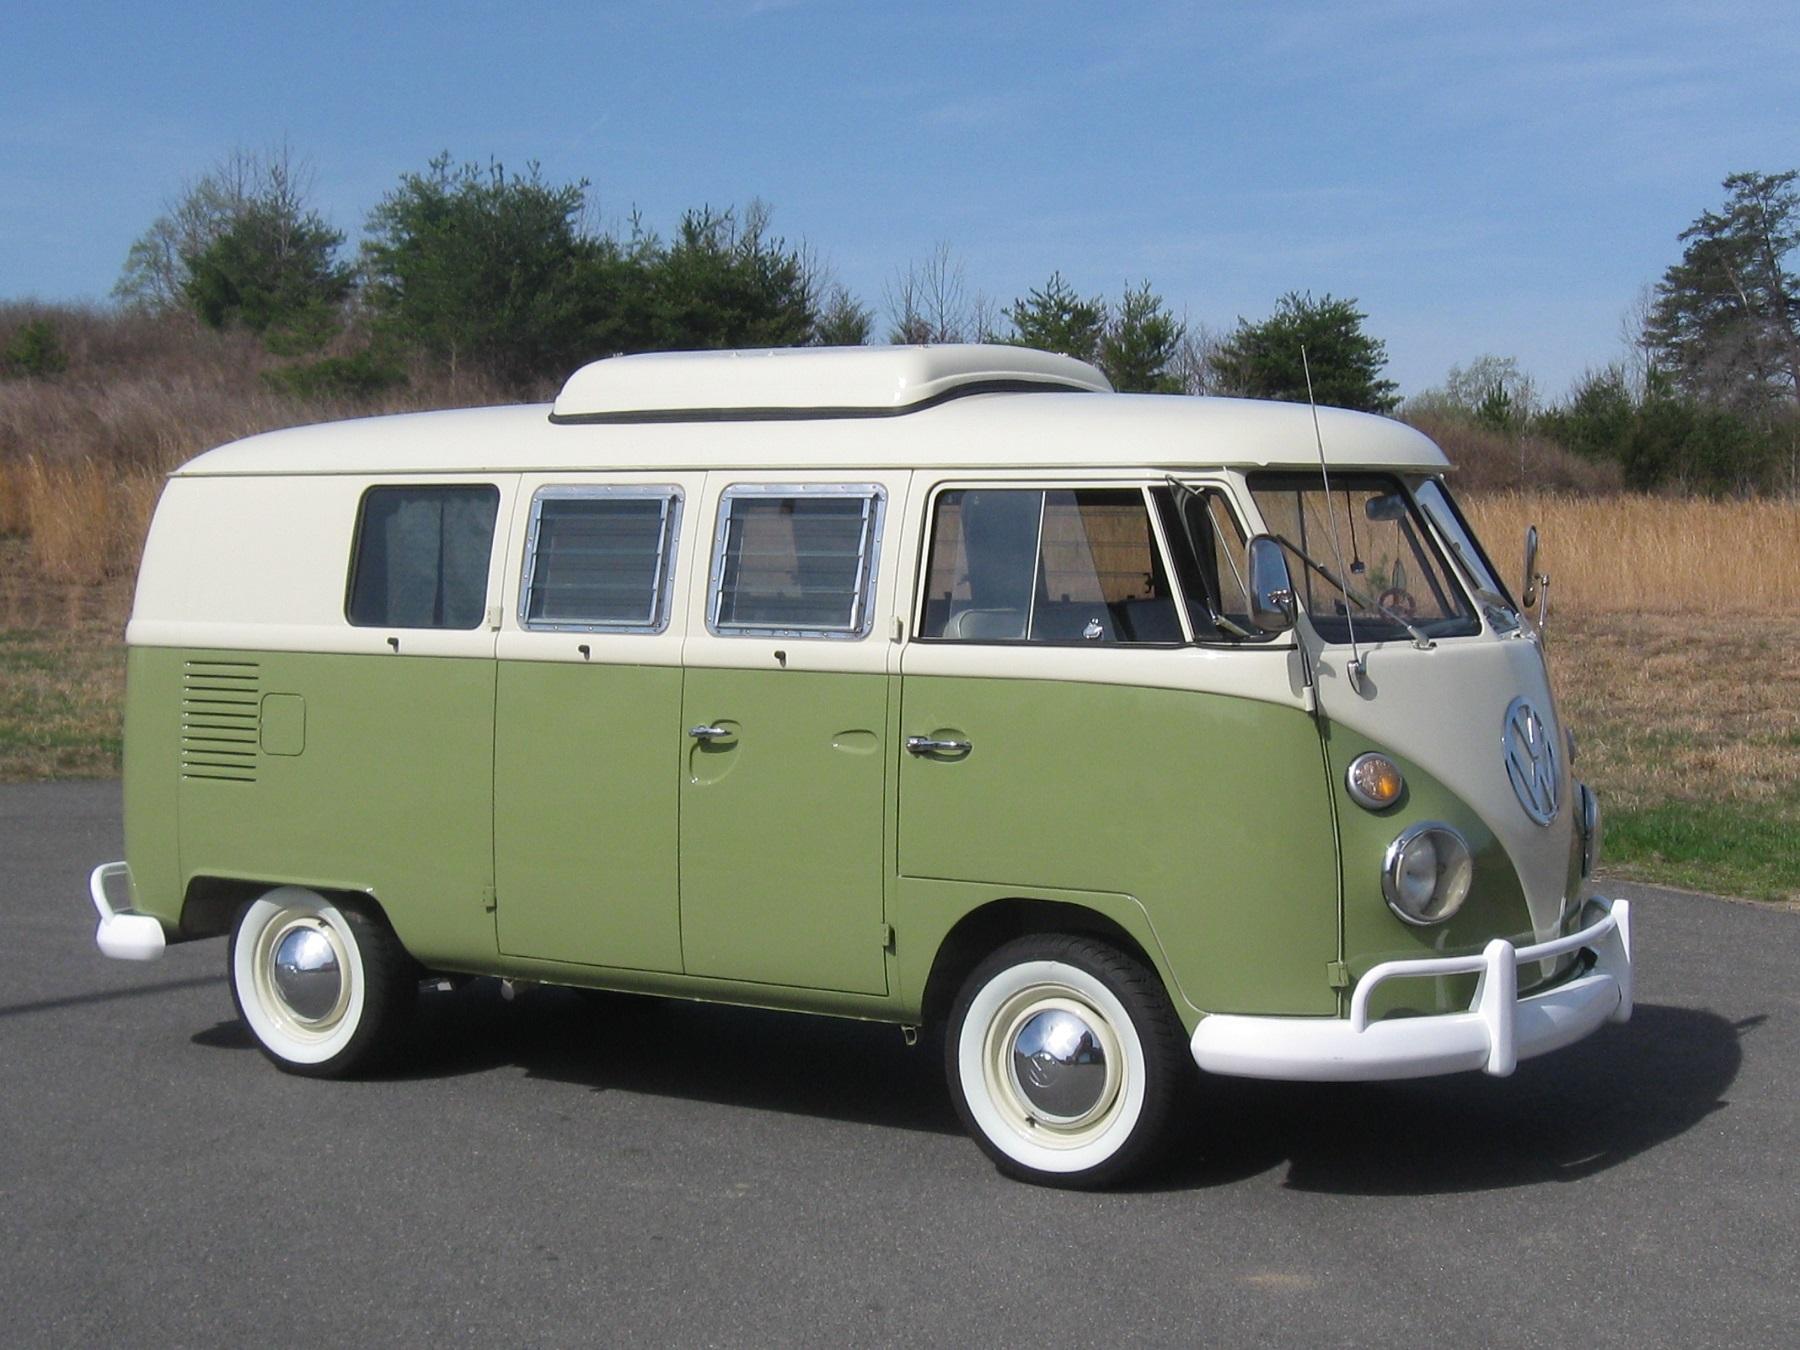 1967 Volkswagen Westfalia: A family camper